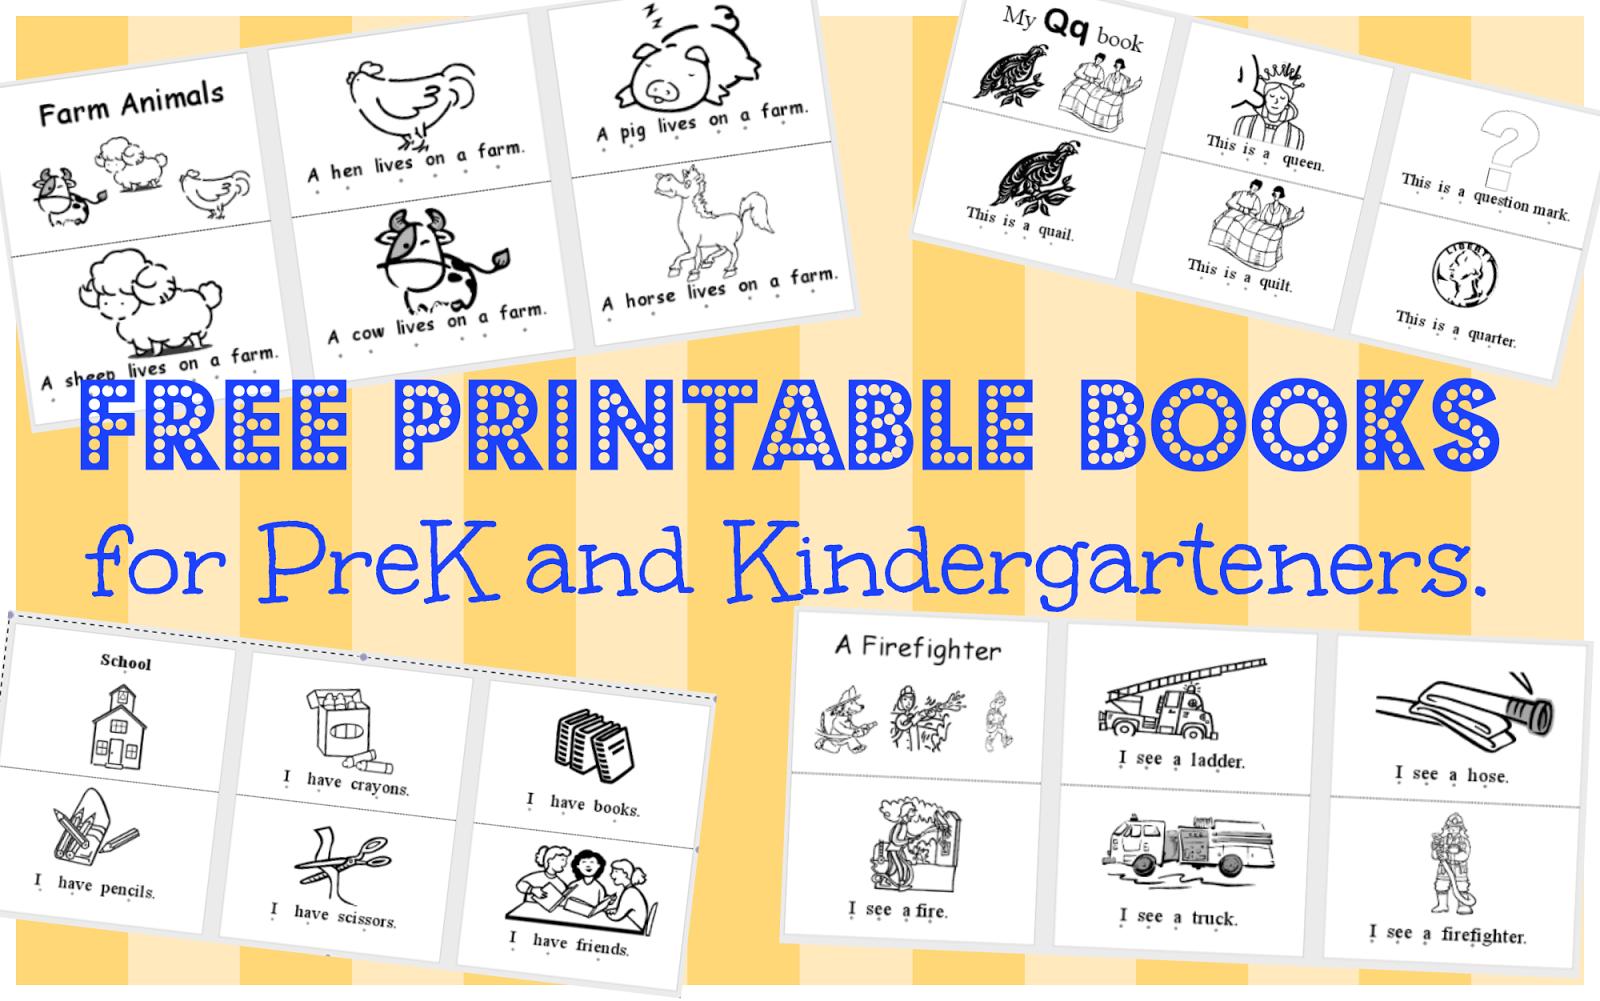 9 best images about free printable books for kindergartners on pinterest - Printable Kindergarten Books